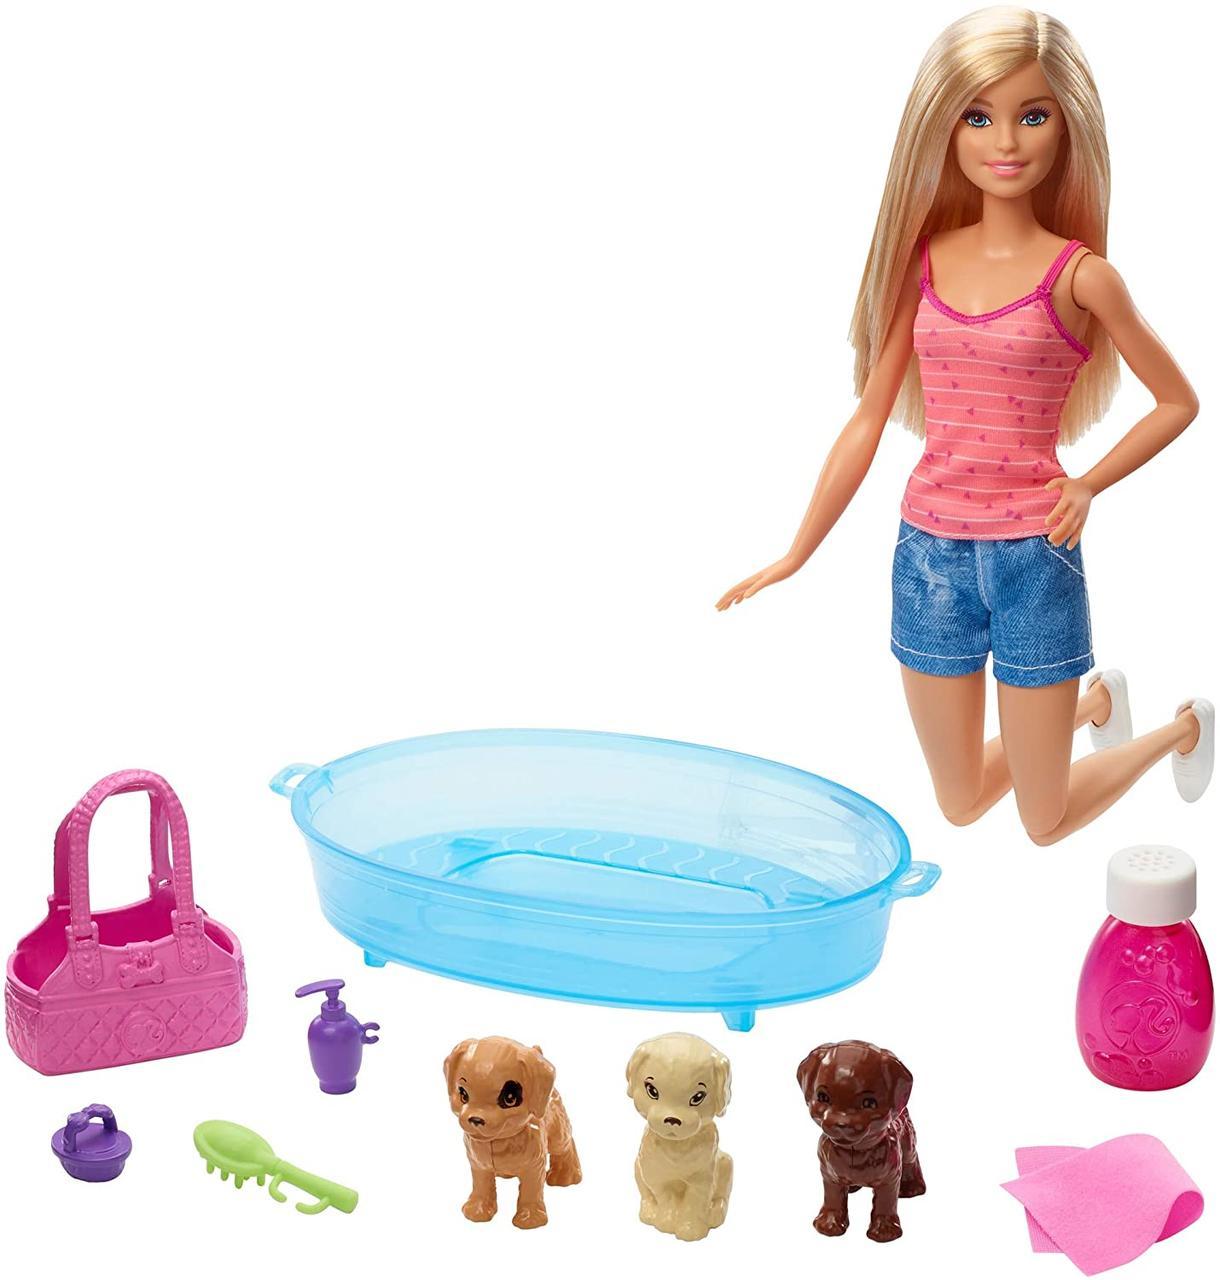 Кукла Барби  купание щенков (Barbie Doll & Puppy Playset, Blonde)